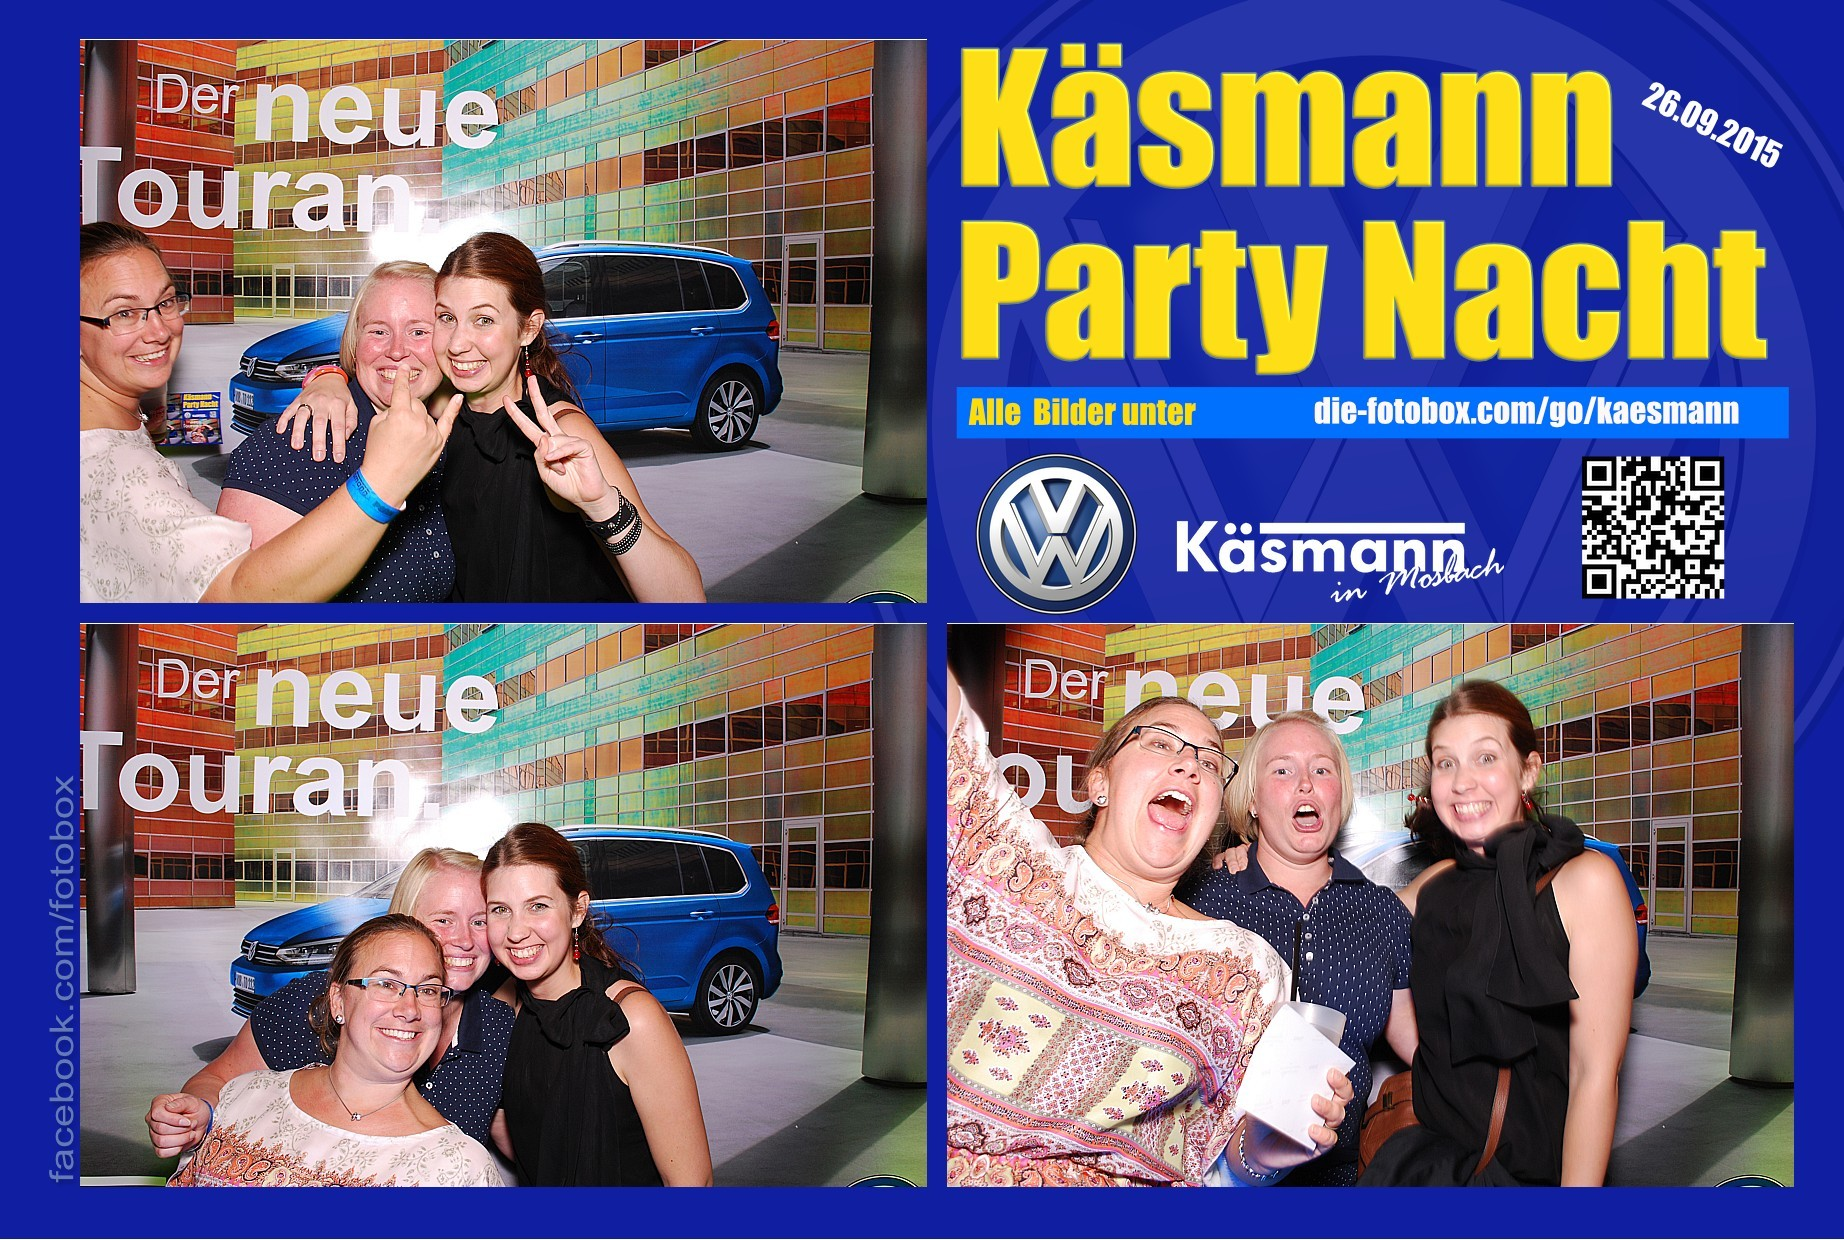 Käsmannparty 2015 - www.die-fotobox.com 01000